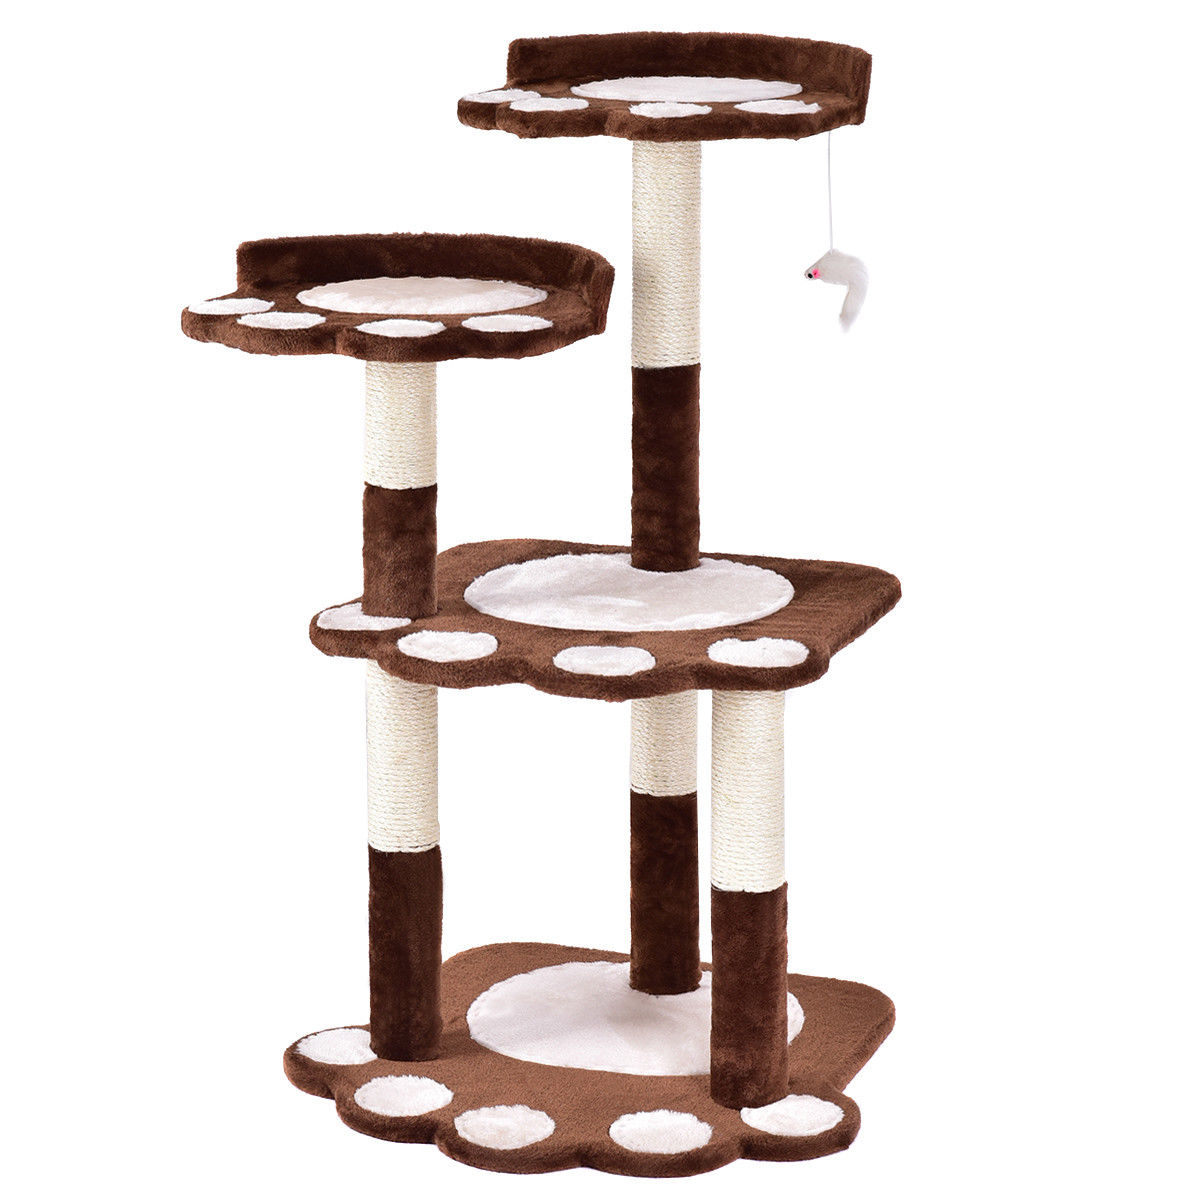 Gymax 42'' Cat Tree Kitten Pet Furniture Multi-level Climb Scratching Posts Paw Brown - image 7 de 10